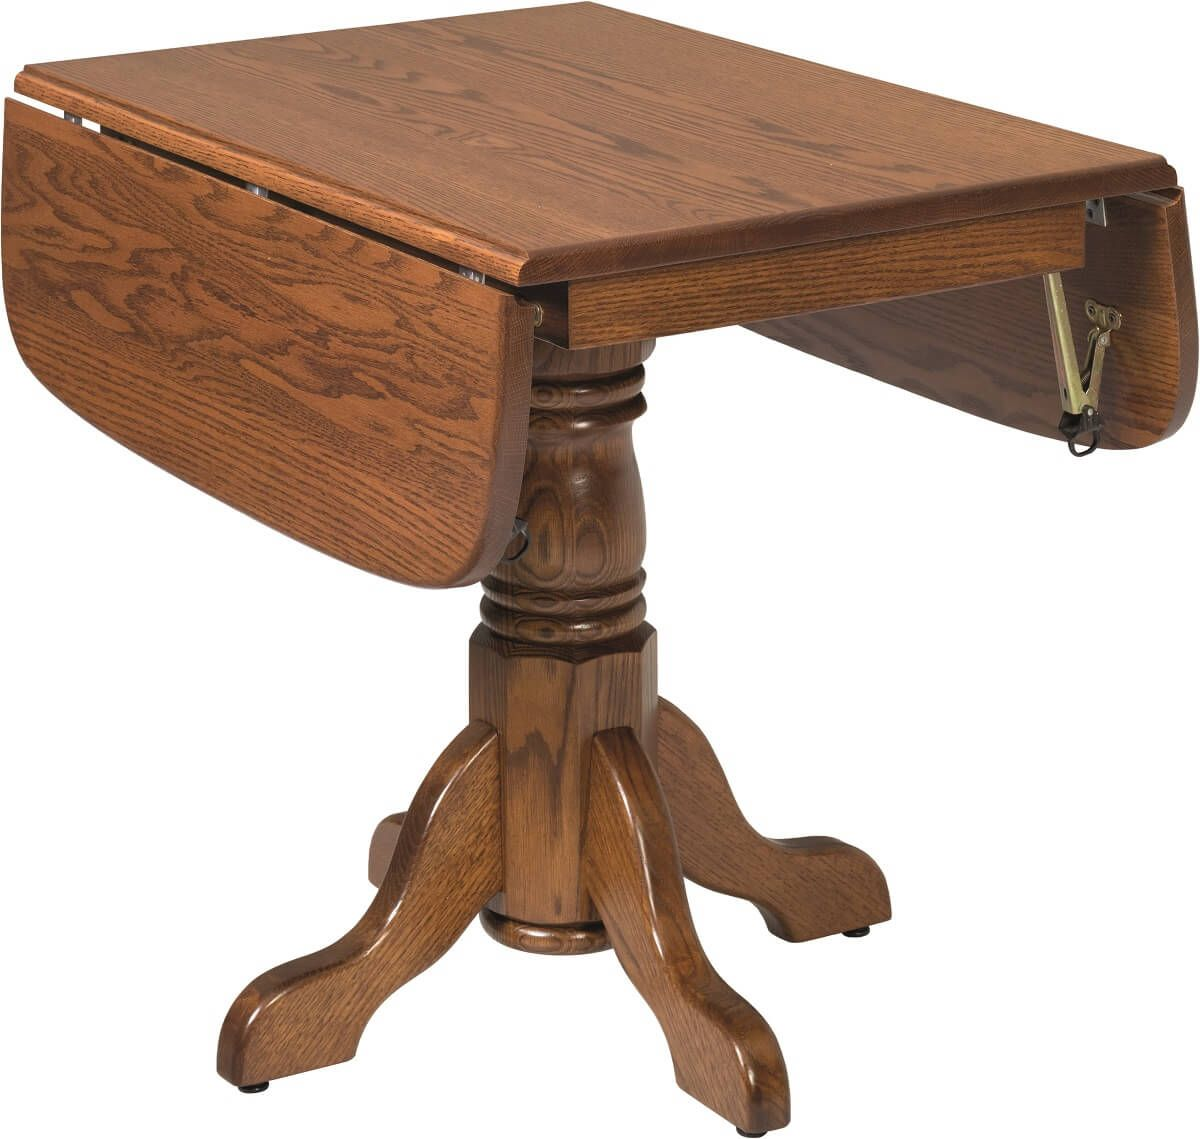 River Shore Pedestal Drop Leaf Table Countryside Amish Furniture